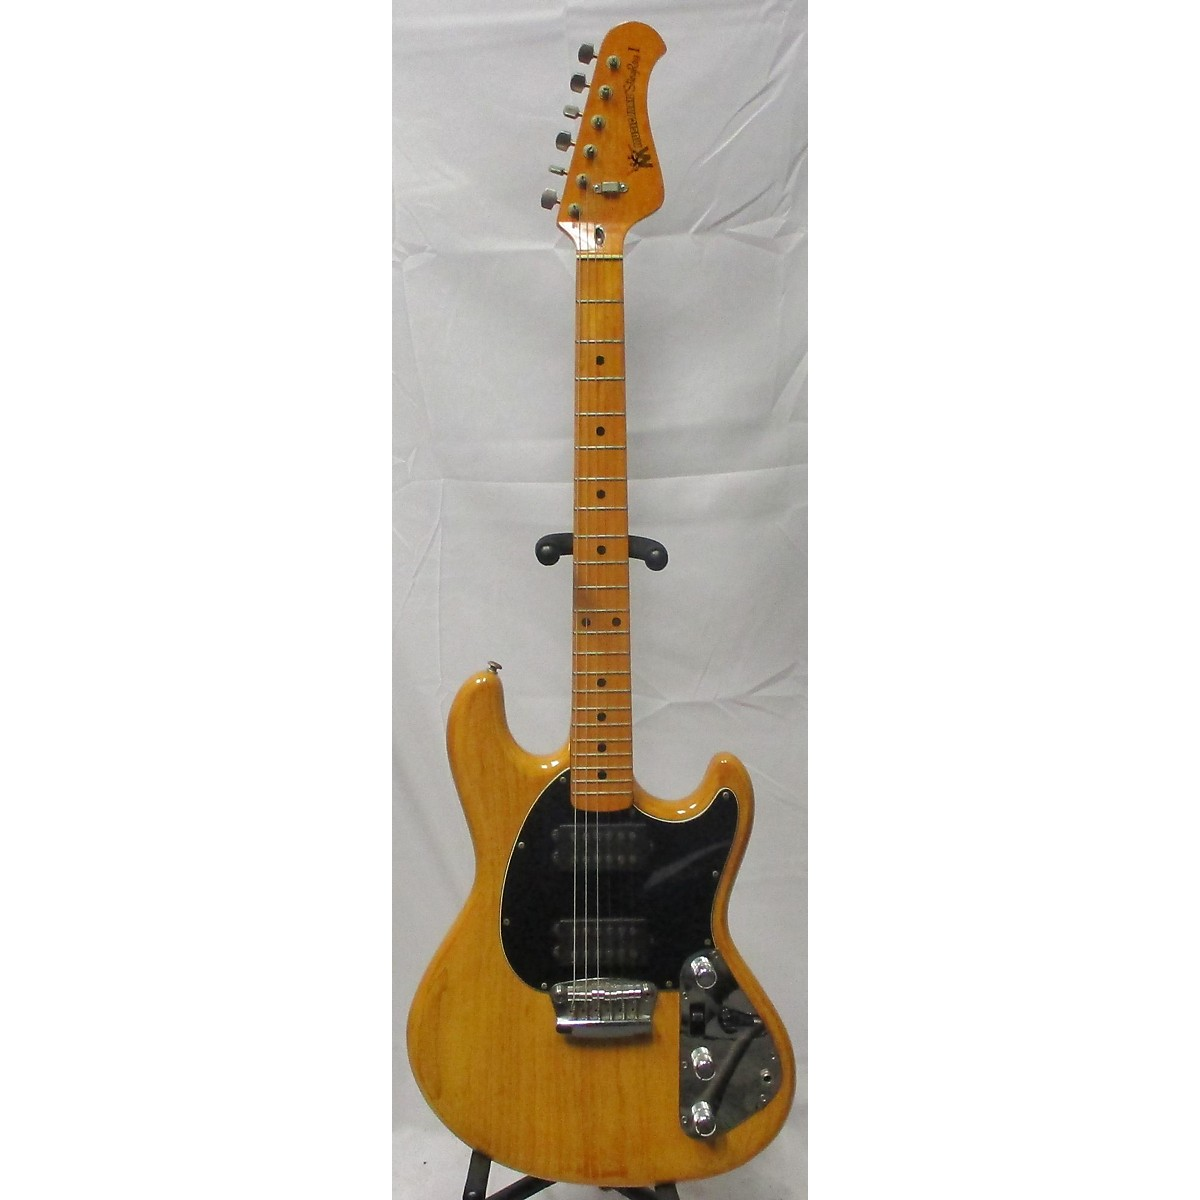 Ernie Ball Music Man 1976 Stingray I Solid Body Electric Guitar